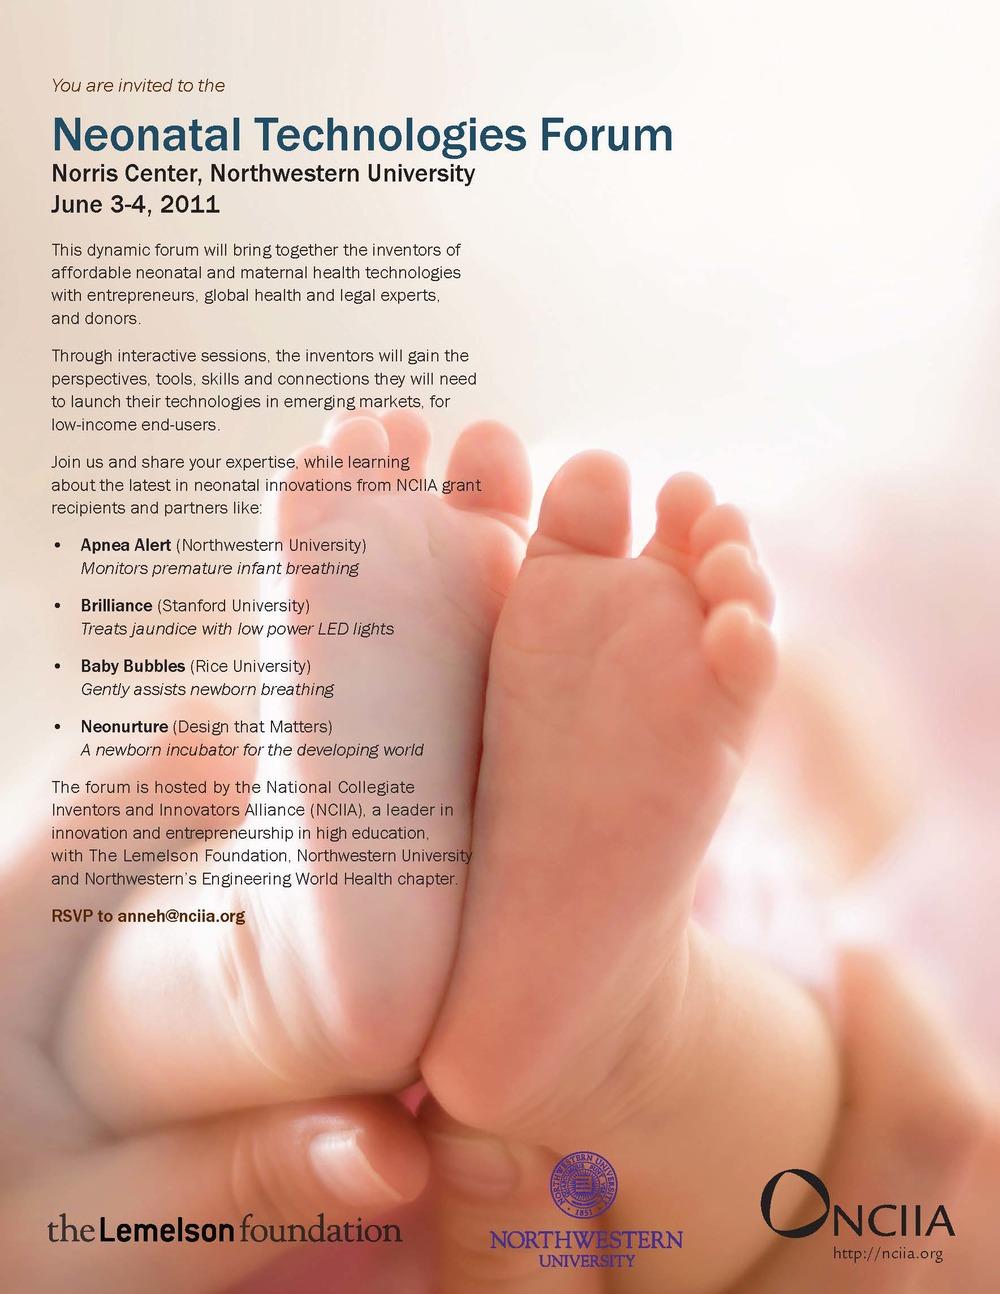 Neonatal Technologies Forum flyer